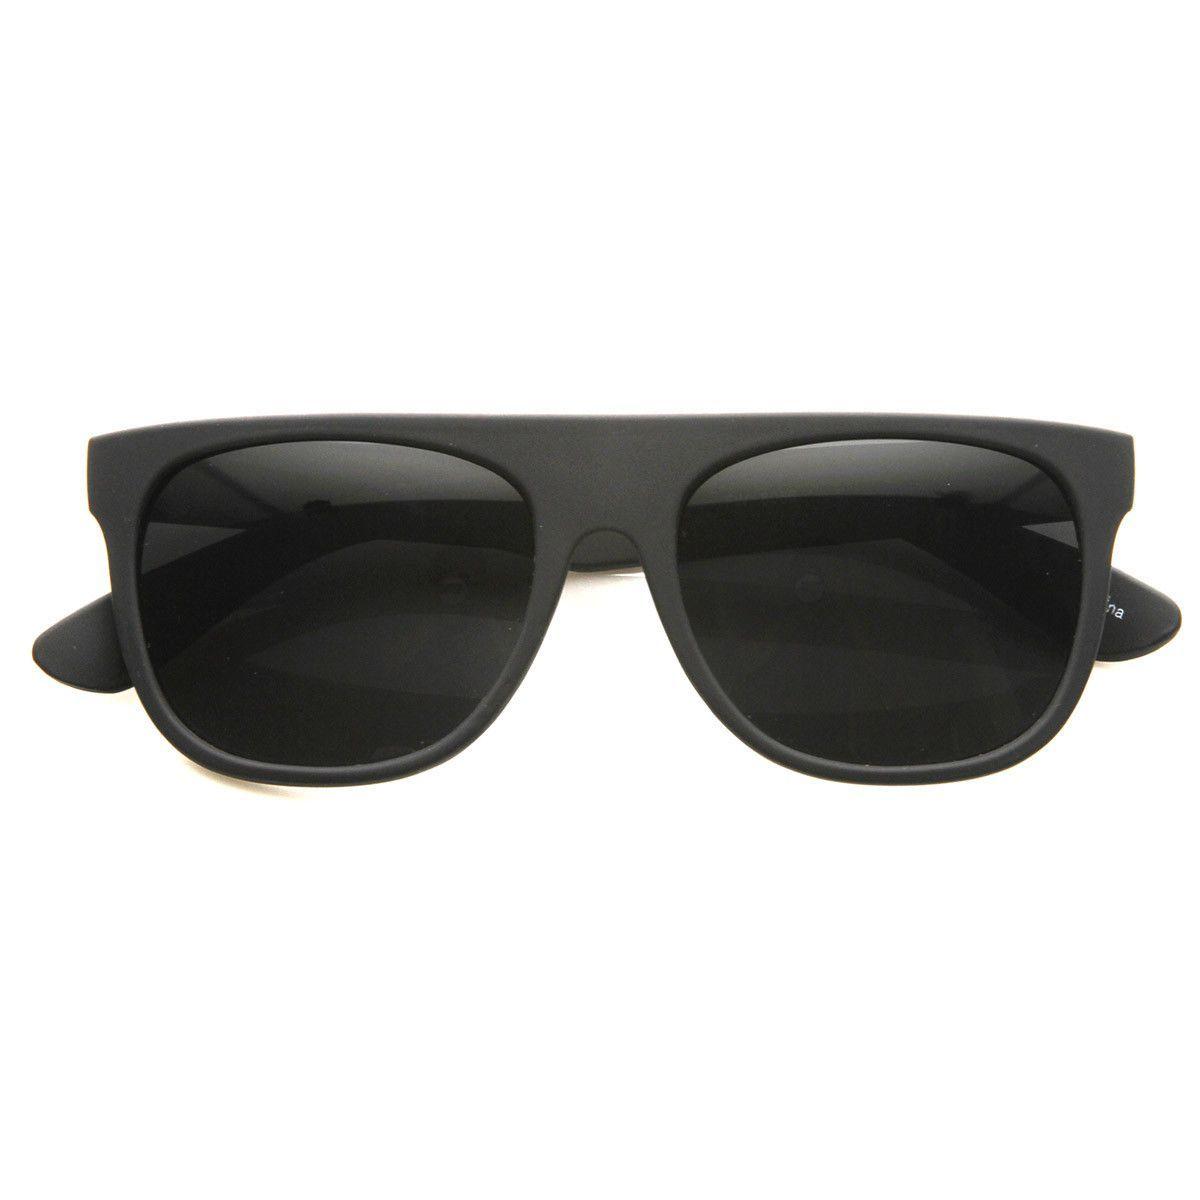 32429ff004 Modern Retro Flat-Top Aviator Style Sunglasses Super Flat Clean Shades